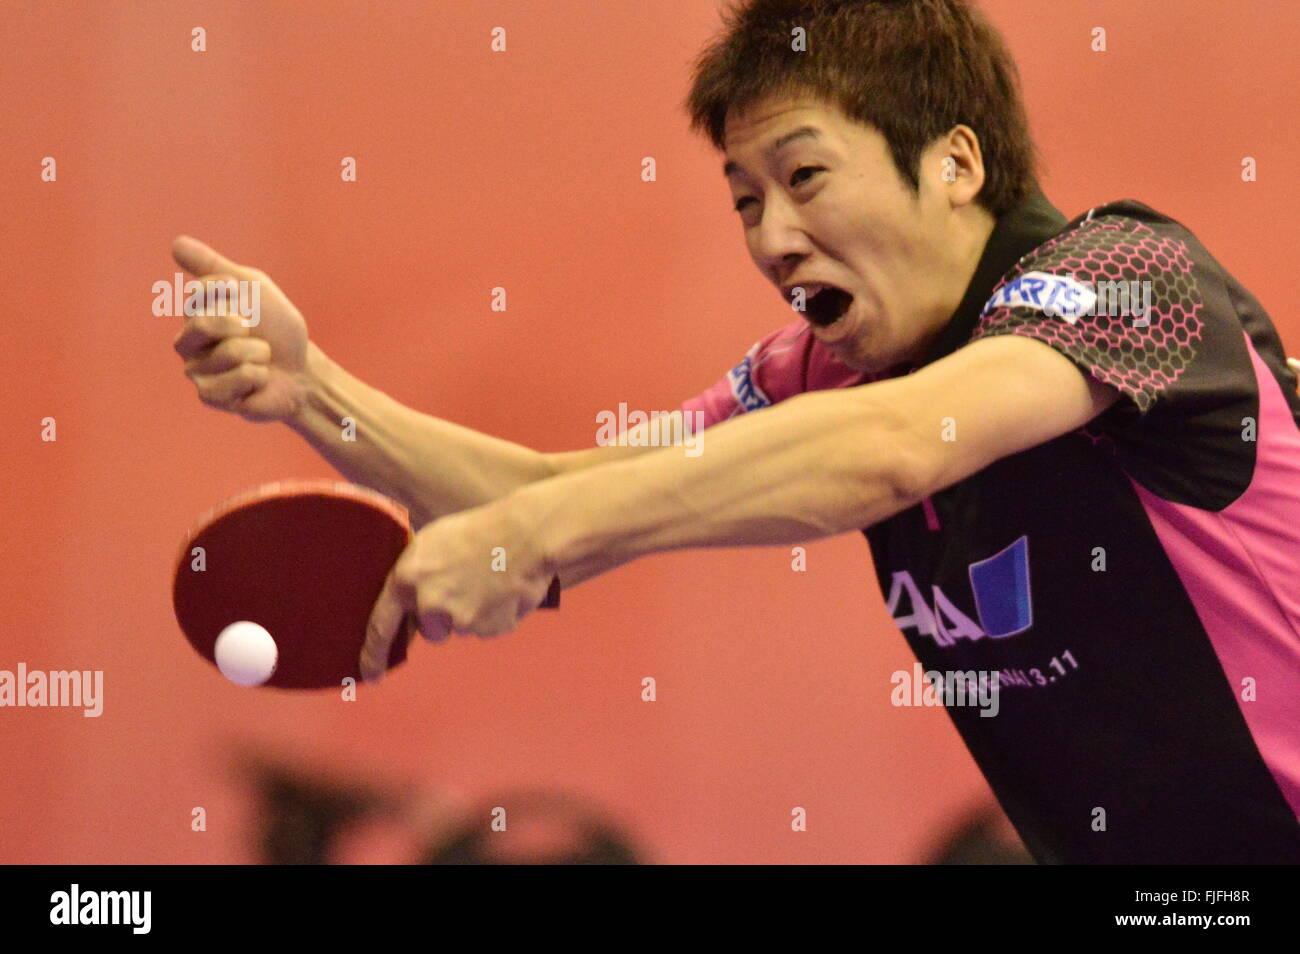 Kuala Lumpur, Malasia. 2 Mar, 2016. Mizutani Jun de Japón compite contra Joao Monteiro de Portugal durante Imagen De Stock